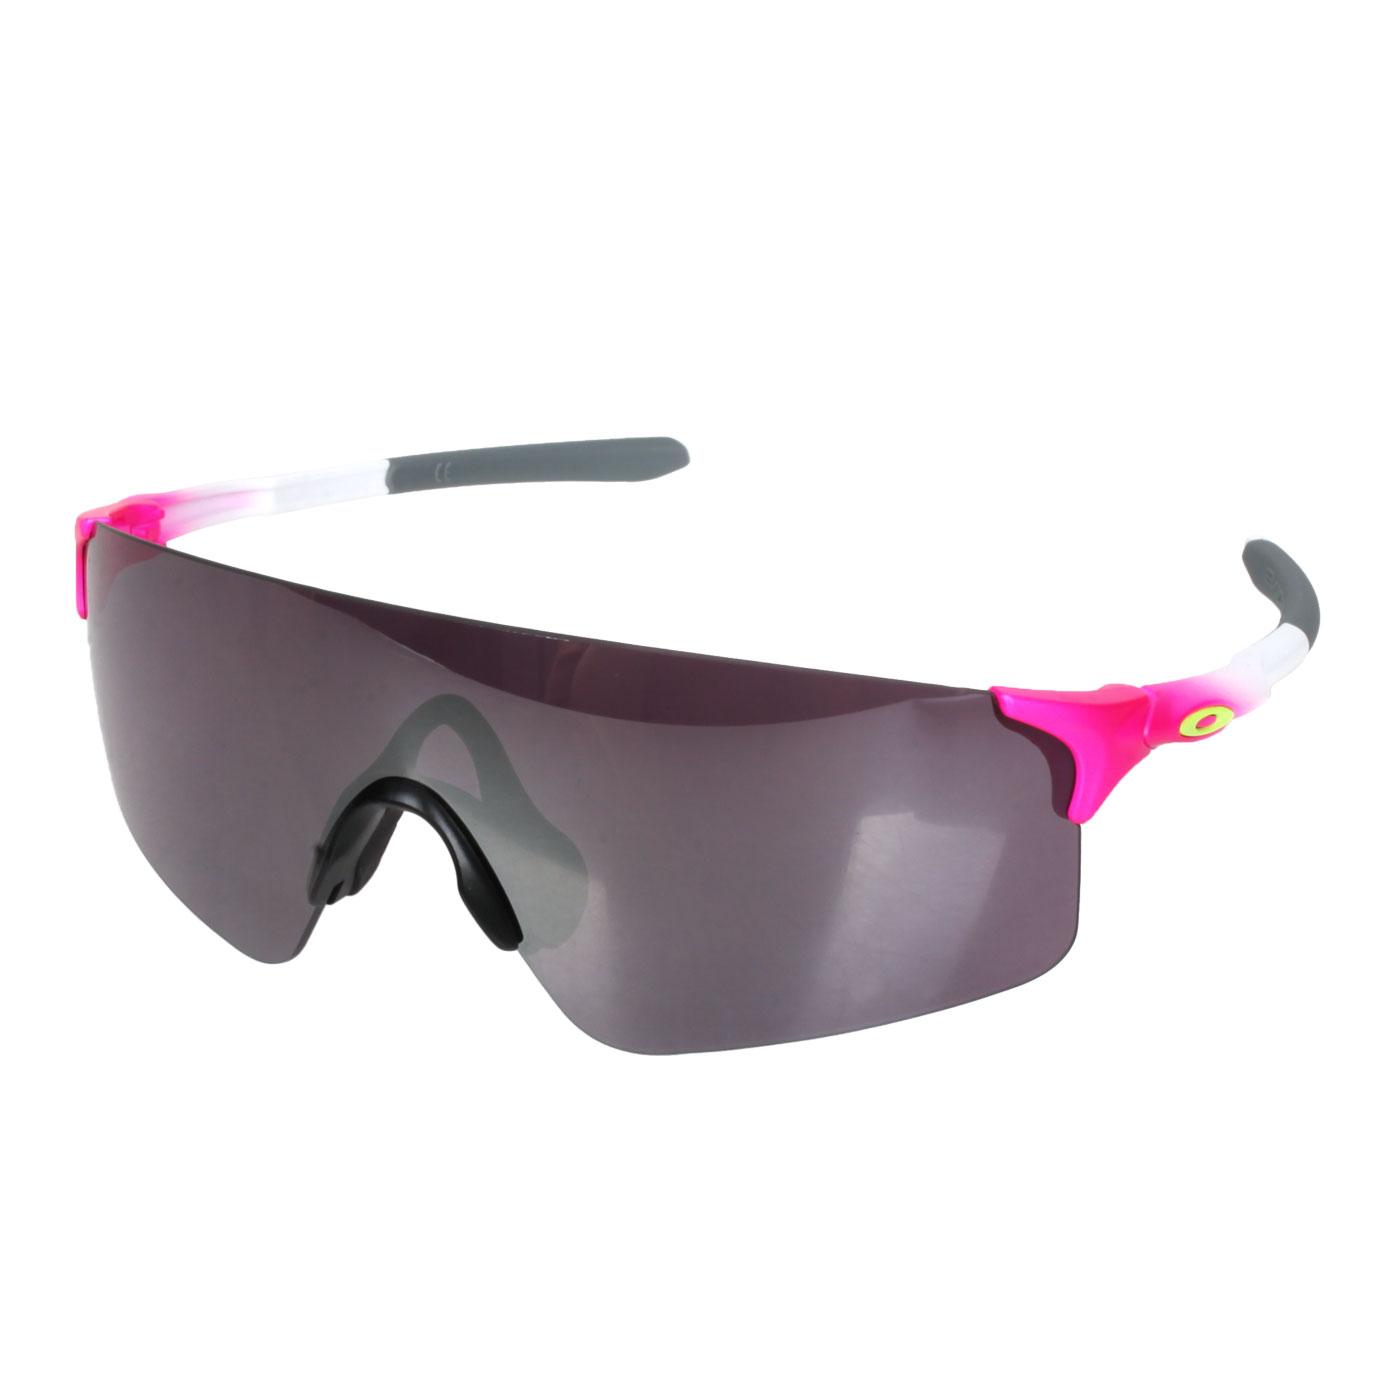 OAKLEY EVZERO BLADES 一般太陽眼鏡 (附硬盒) OAK-OO9454-0838 - 白桃紅紫綠